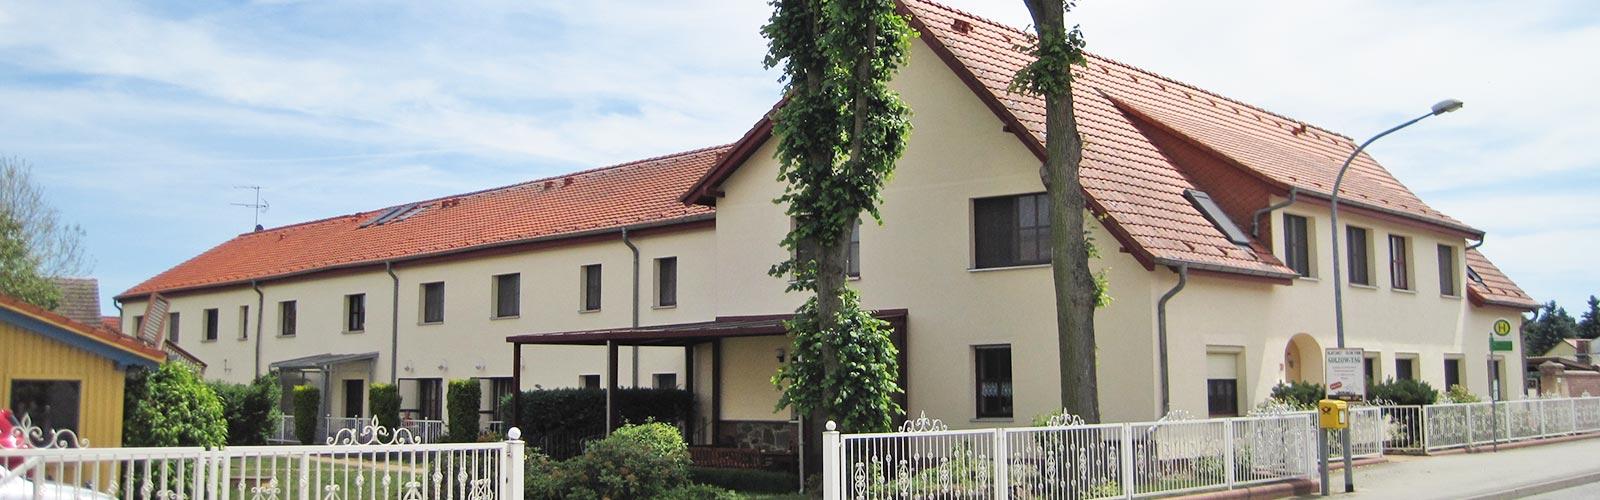 Ruhesitz Golzow, Belziger Str. 10 in 14778 Golzow